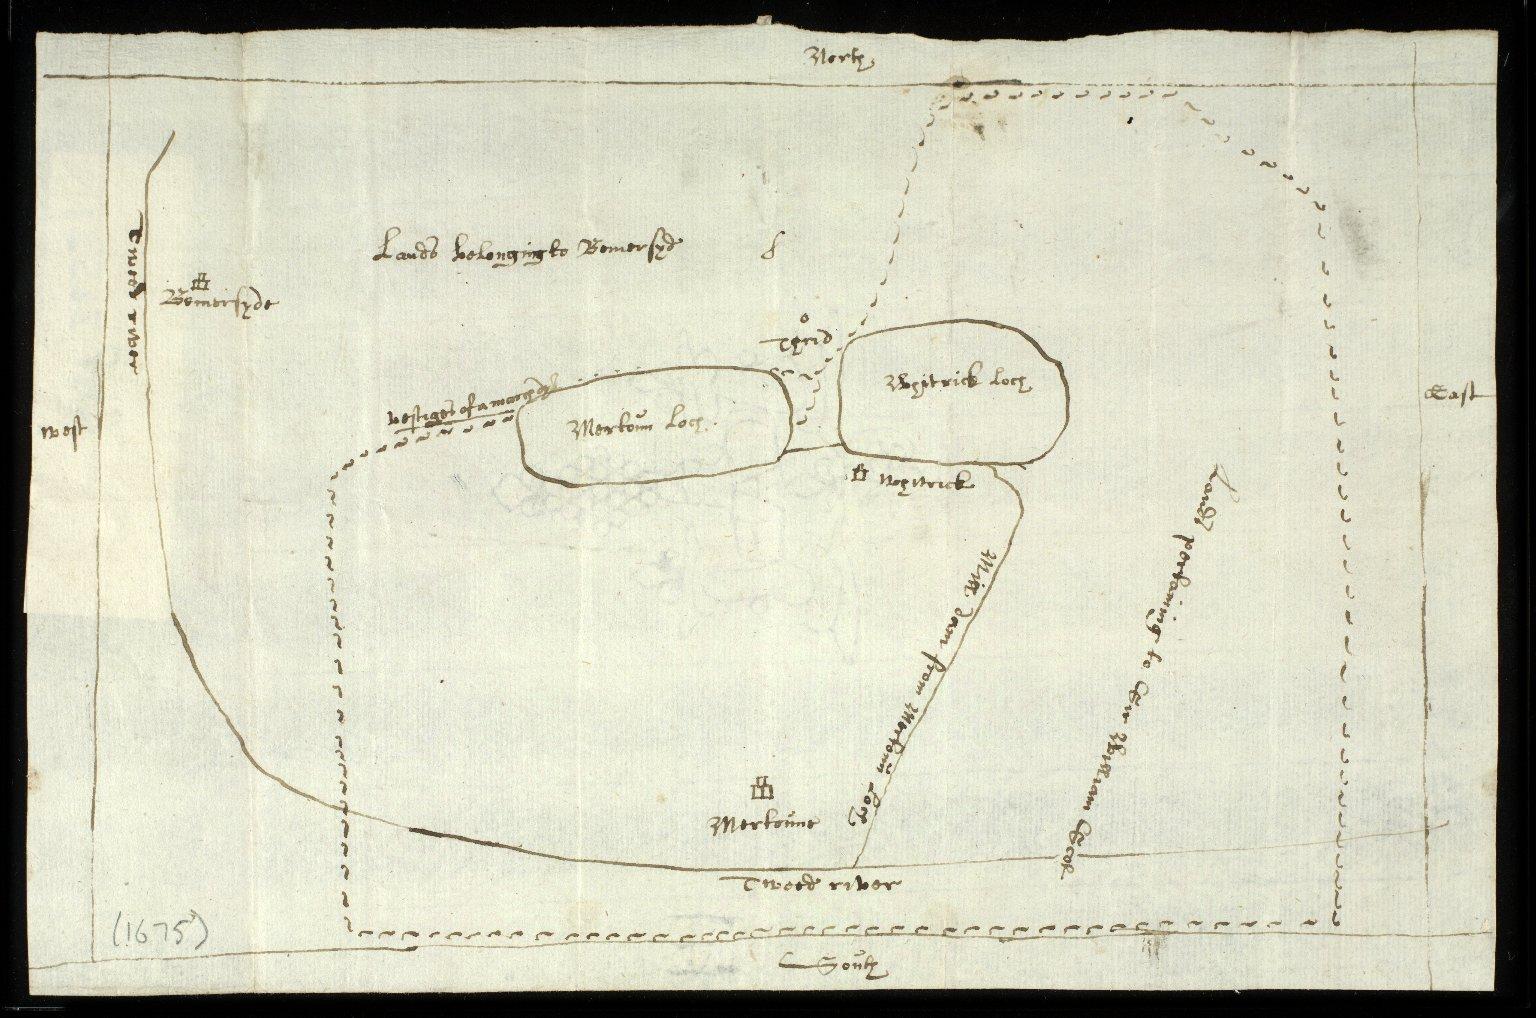 [Sketch plan of the lands of Mertoun, in the parish of Mertoun, Berwickshire] [1 of 1]